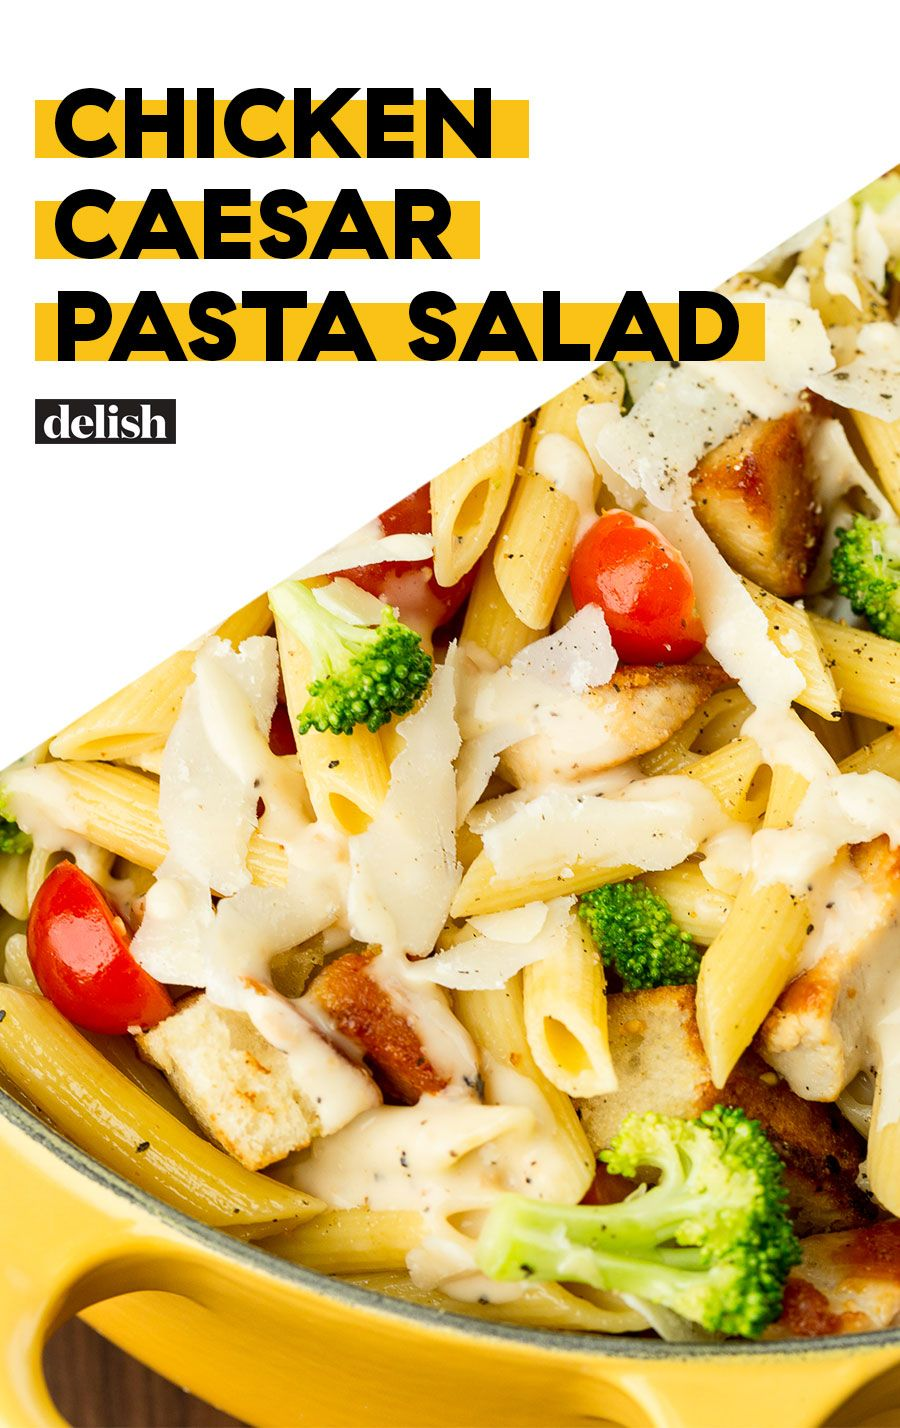 Our New Summertime Fave Chicken Caesar Caesarsalad Pastasalad Sides Easyrecipes Delish Chicken Caesar Pasta Salad Pasta Salad Pasta Dishes